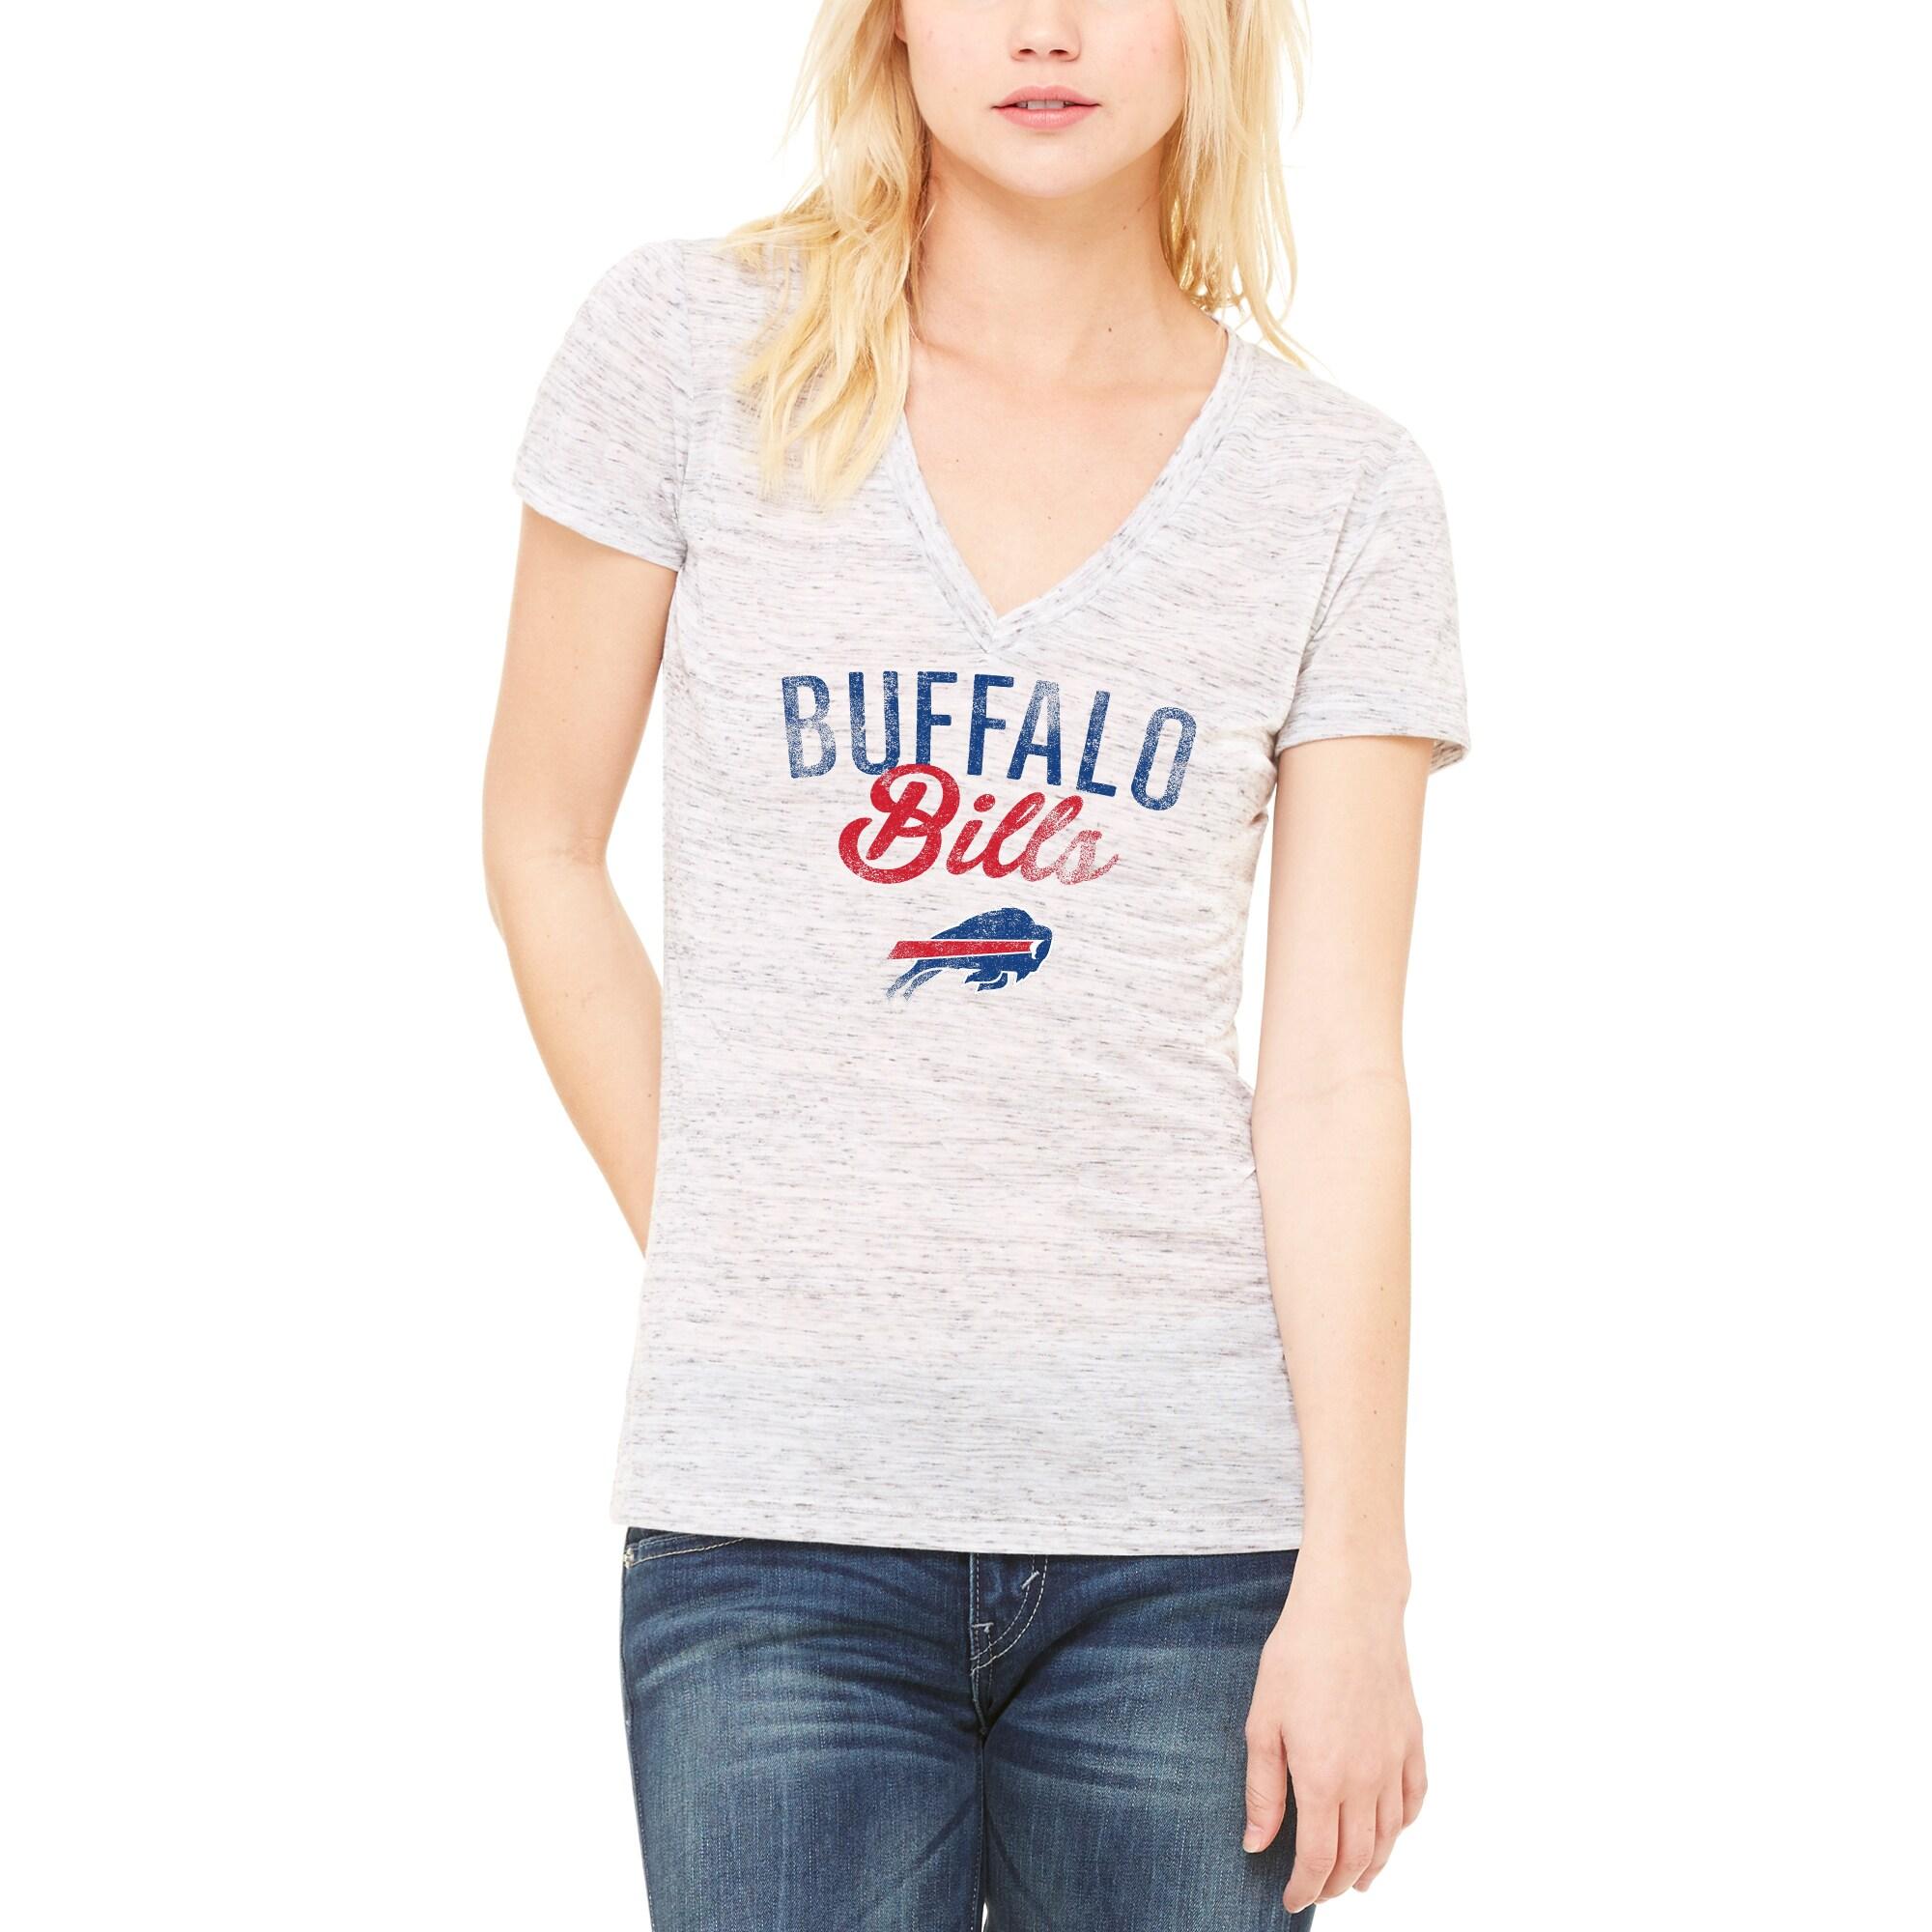 Buffalo Bills Let Loose by RNL Women's Endless V-Neck T-Shirt - White